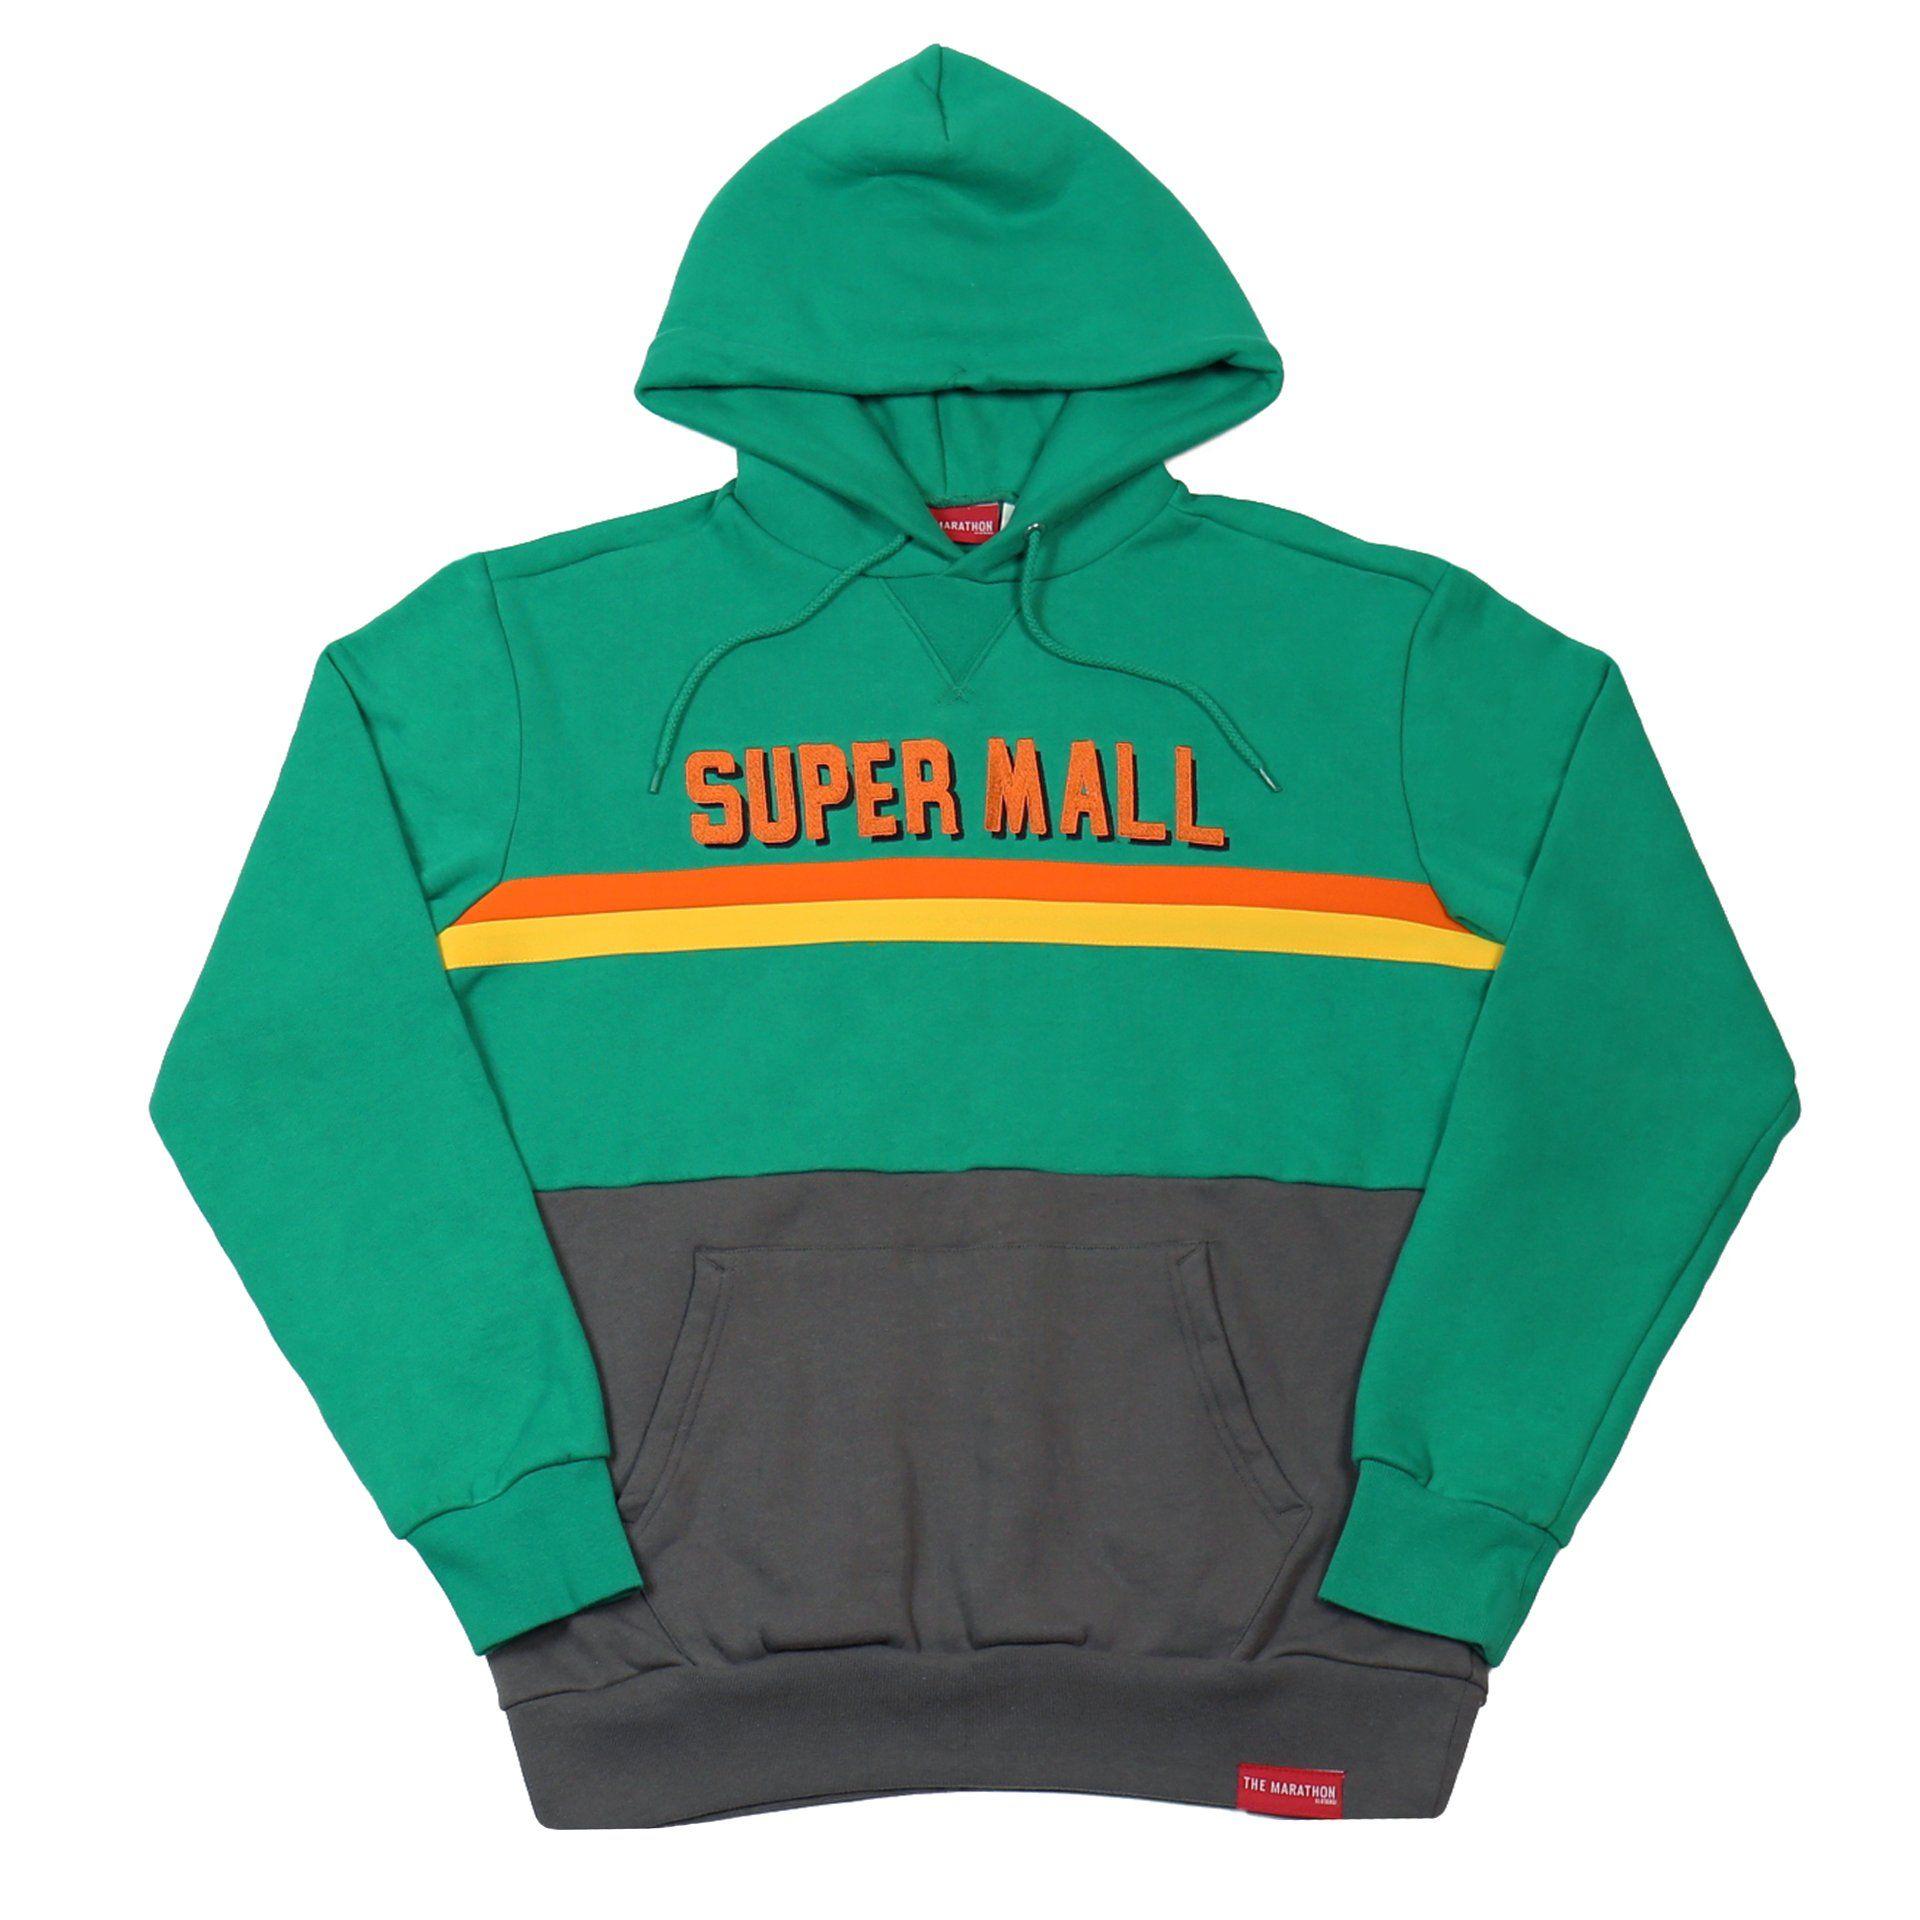 376c14069 Super Mall Hoodie - Green – The Marathon Clothing | streetwear ...